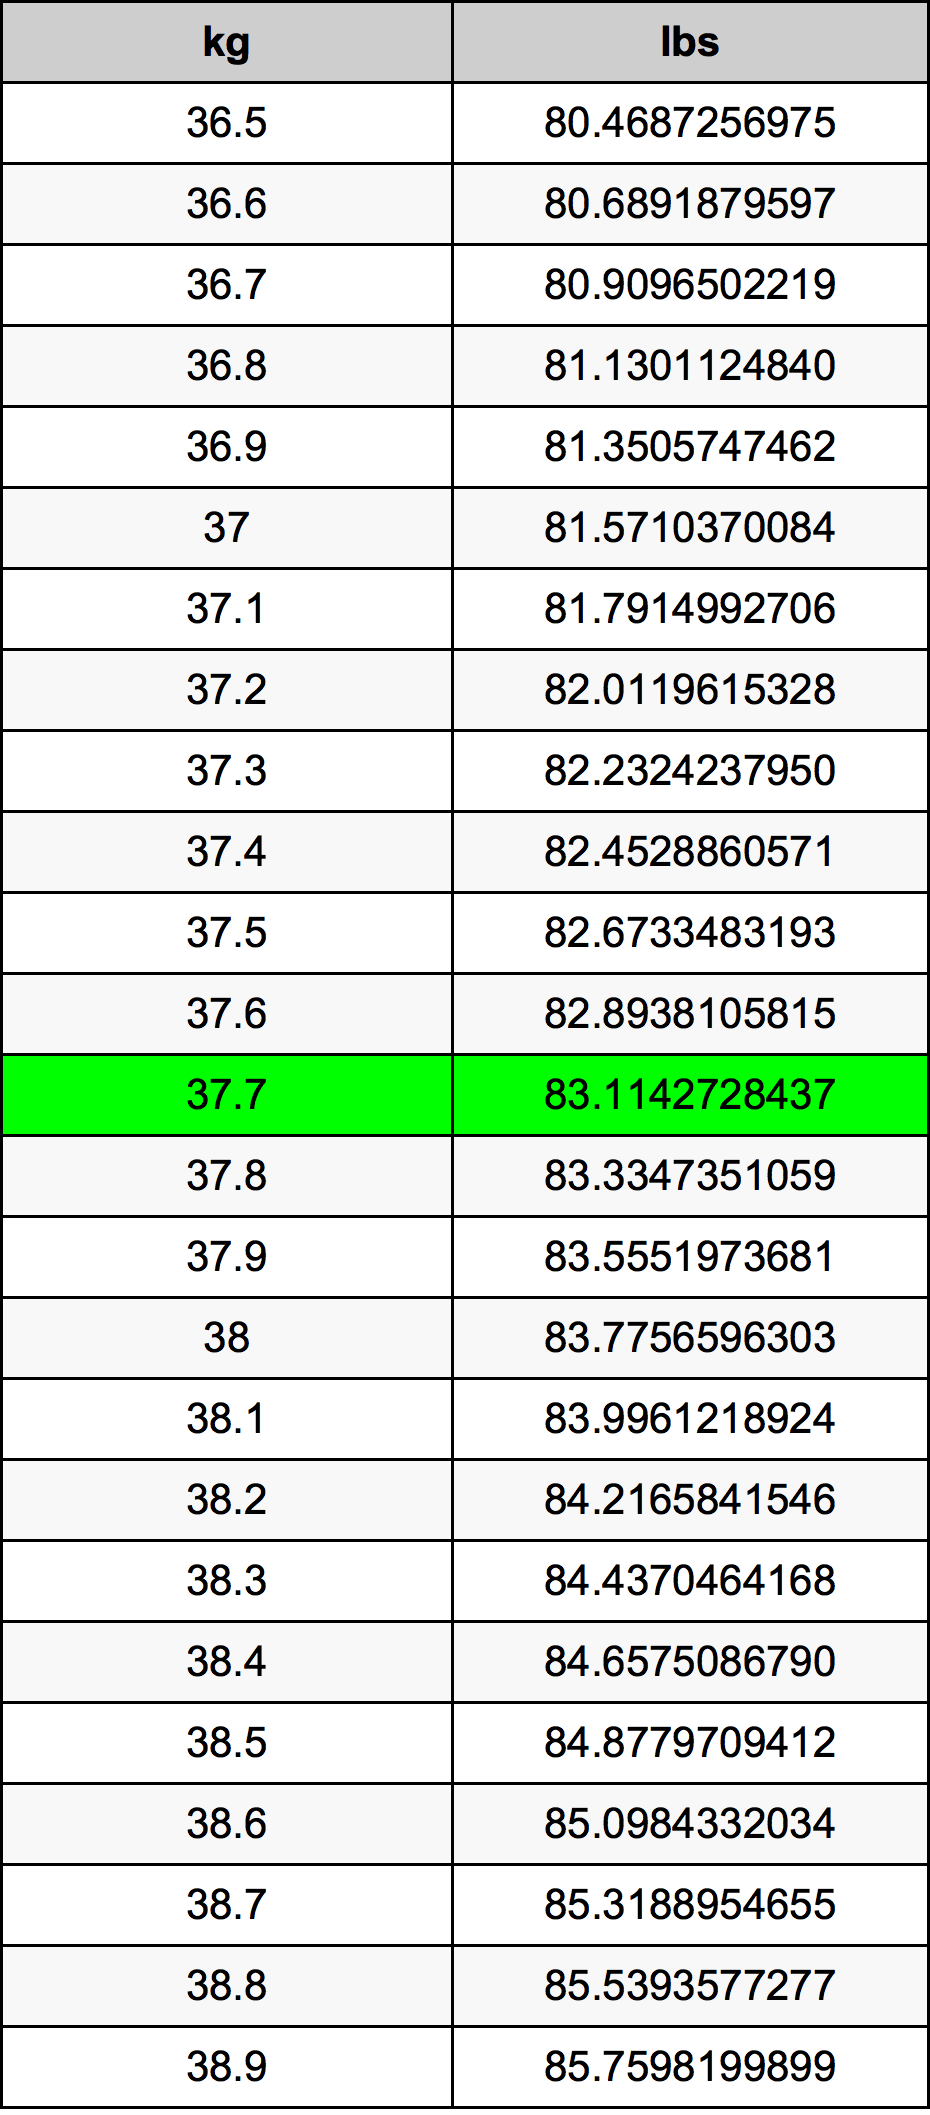 37.7 Kilogram omregningstabel